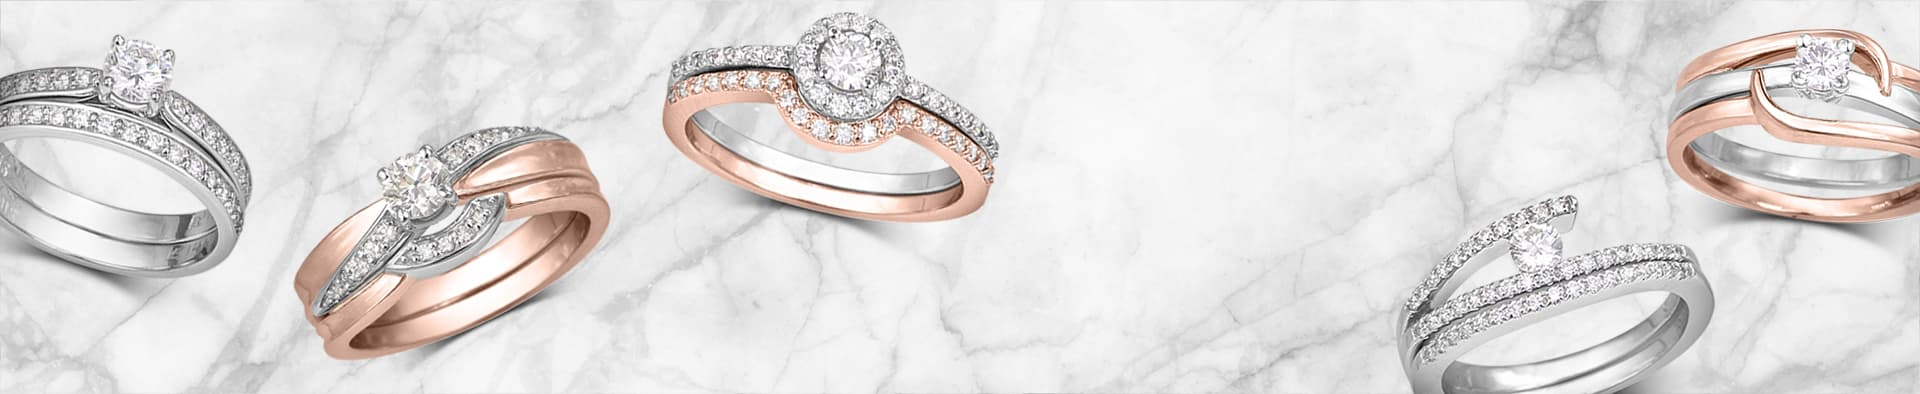 Wedding bridal set with diamonds